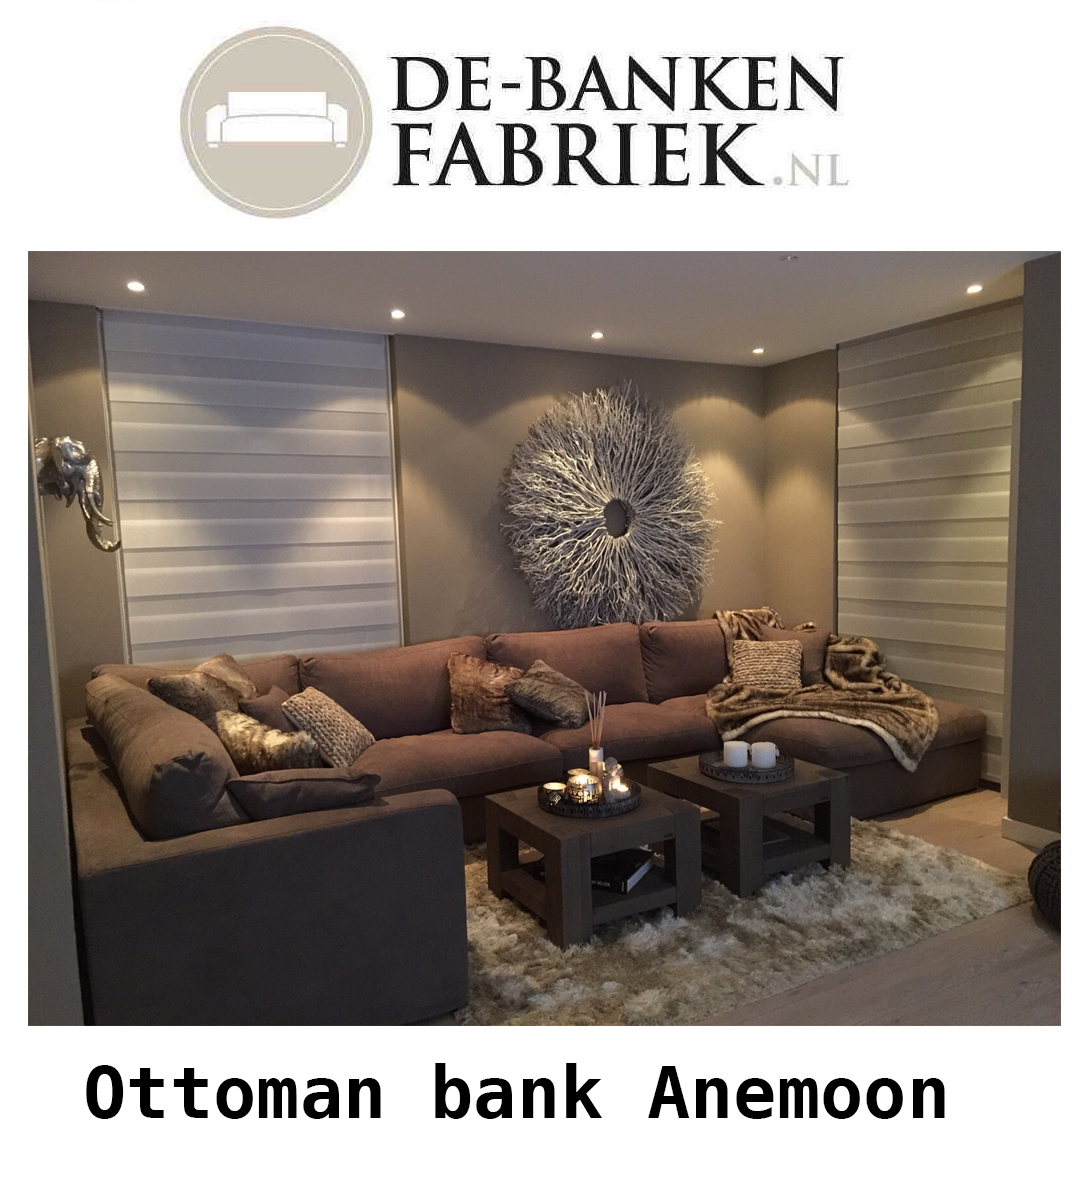 Bankstellen En Zo Almere.Bankstel Almere De Bankenfabriek